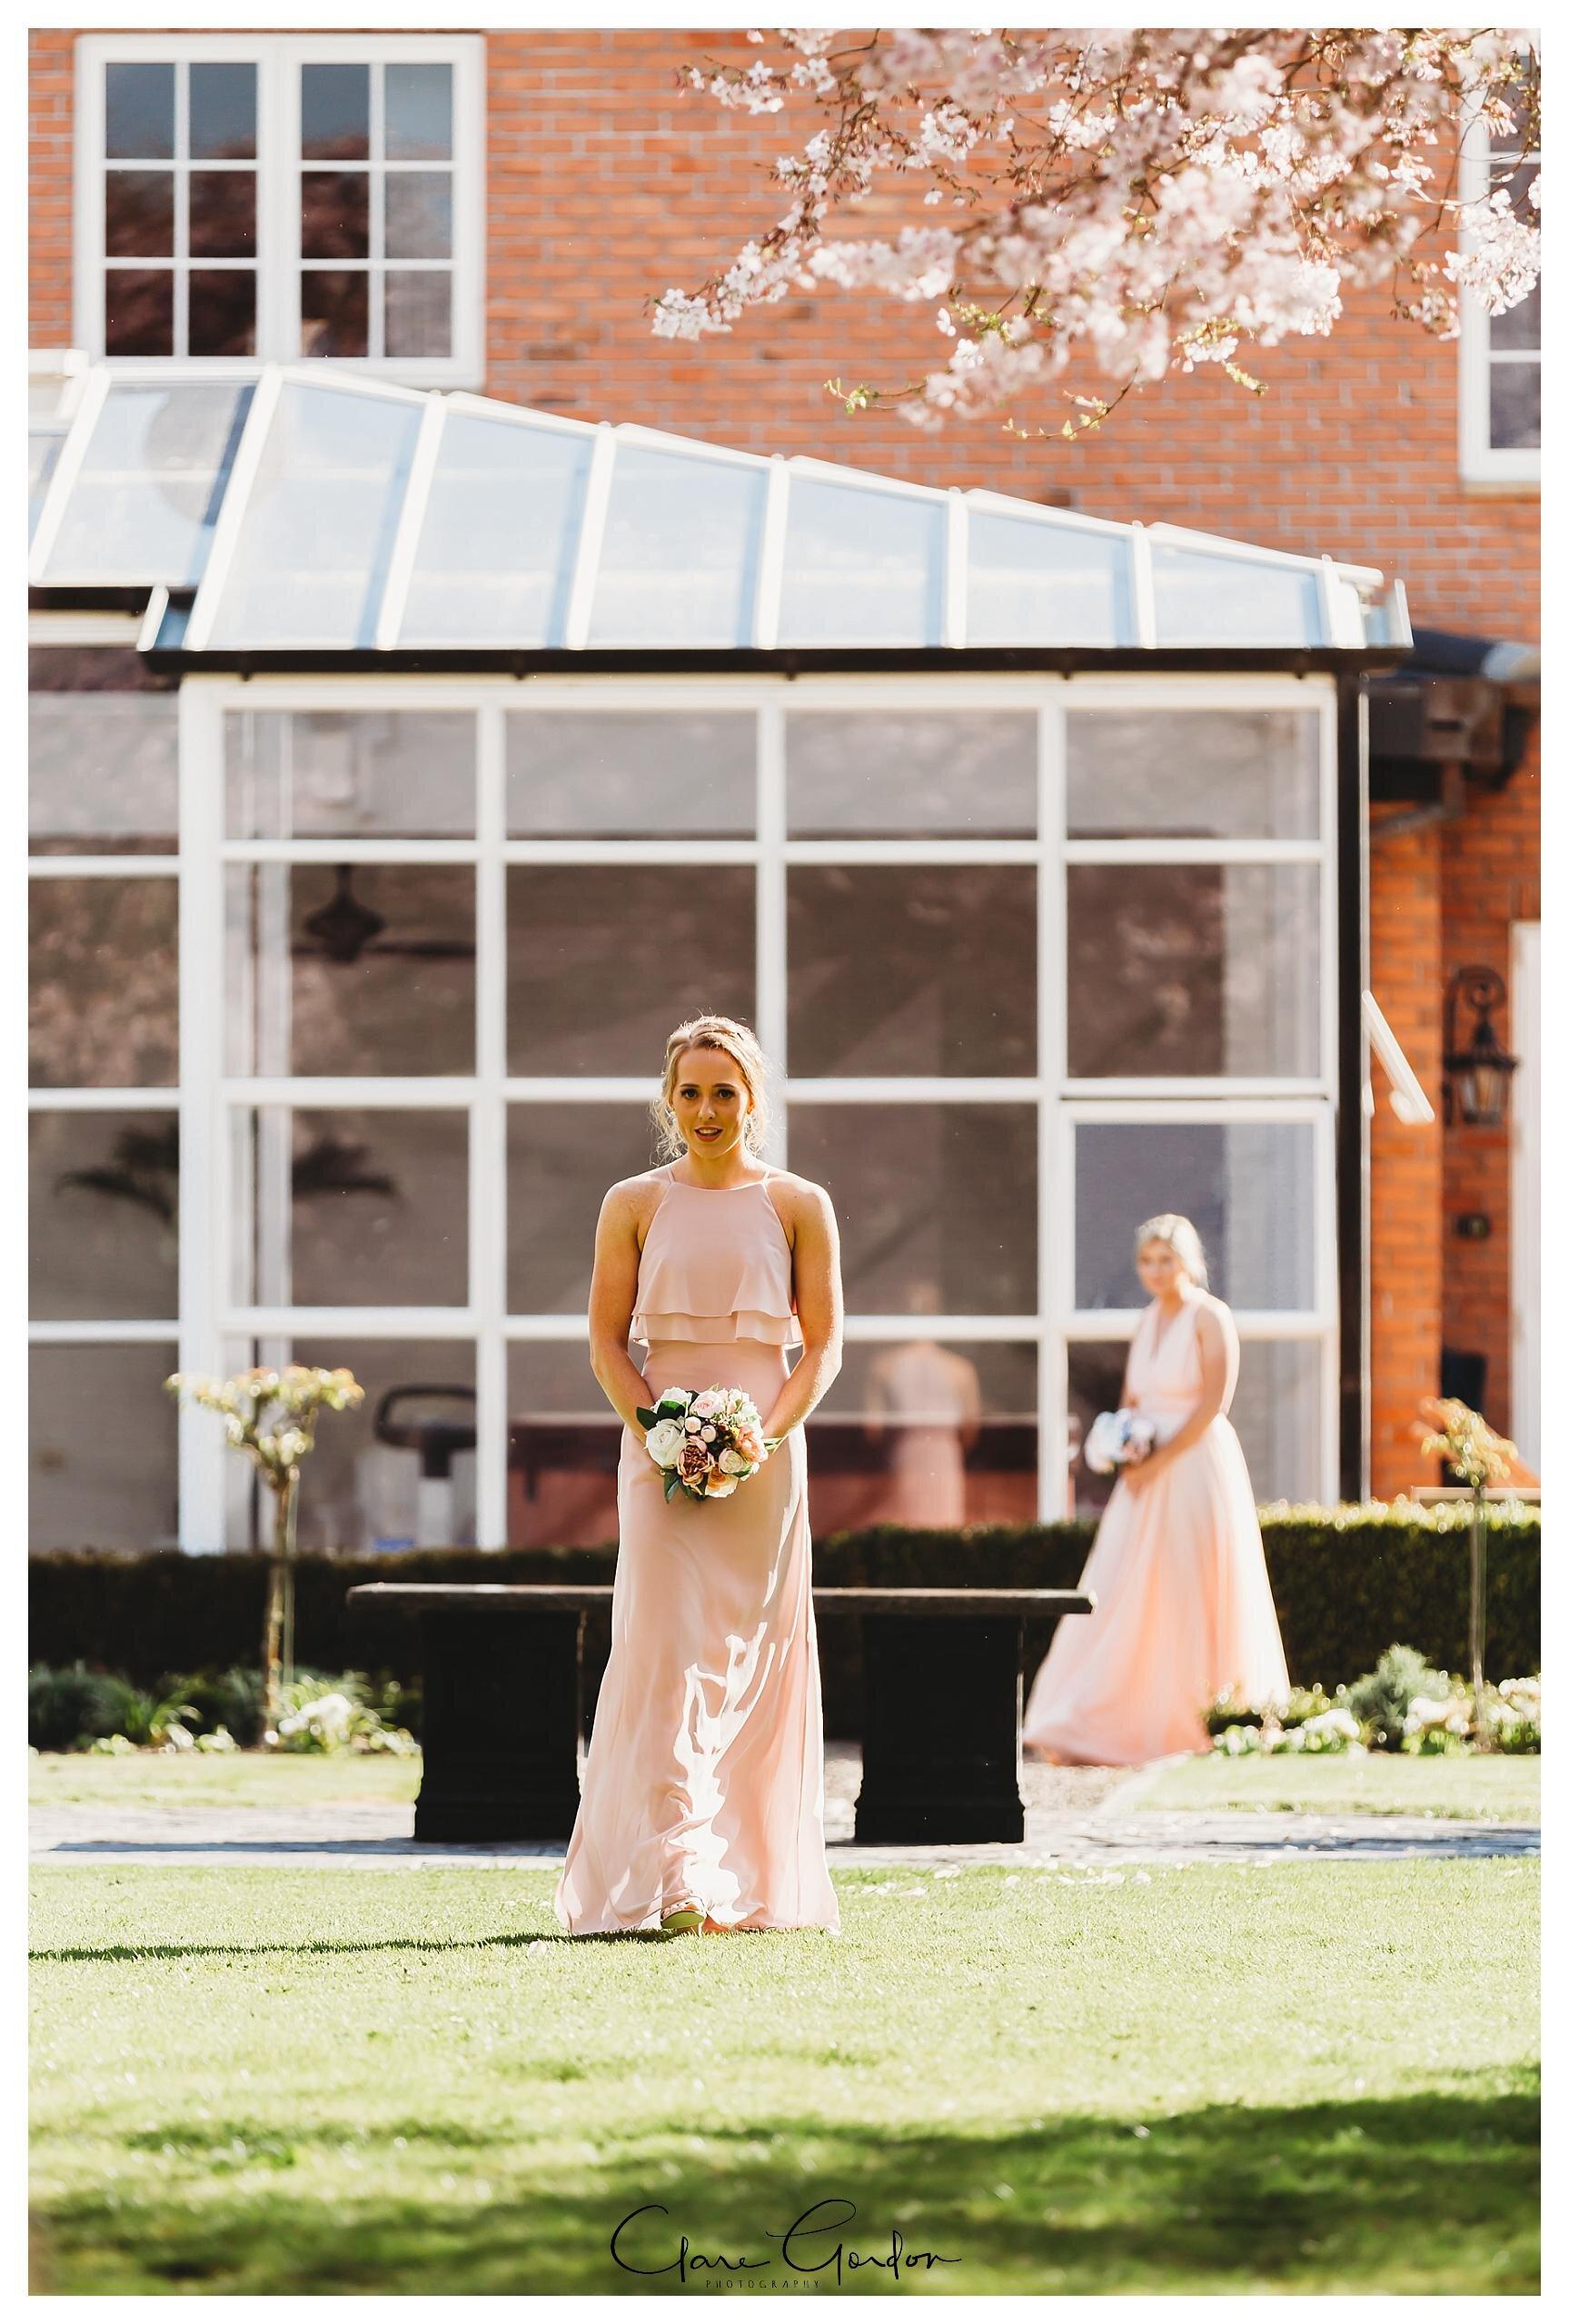 Henley-Hotel-Cherry-blossom-wedding-photos (38).jpg